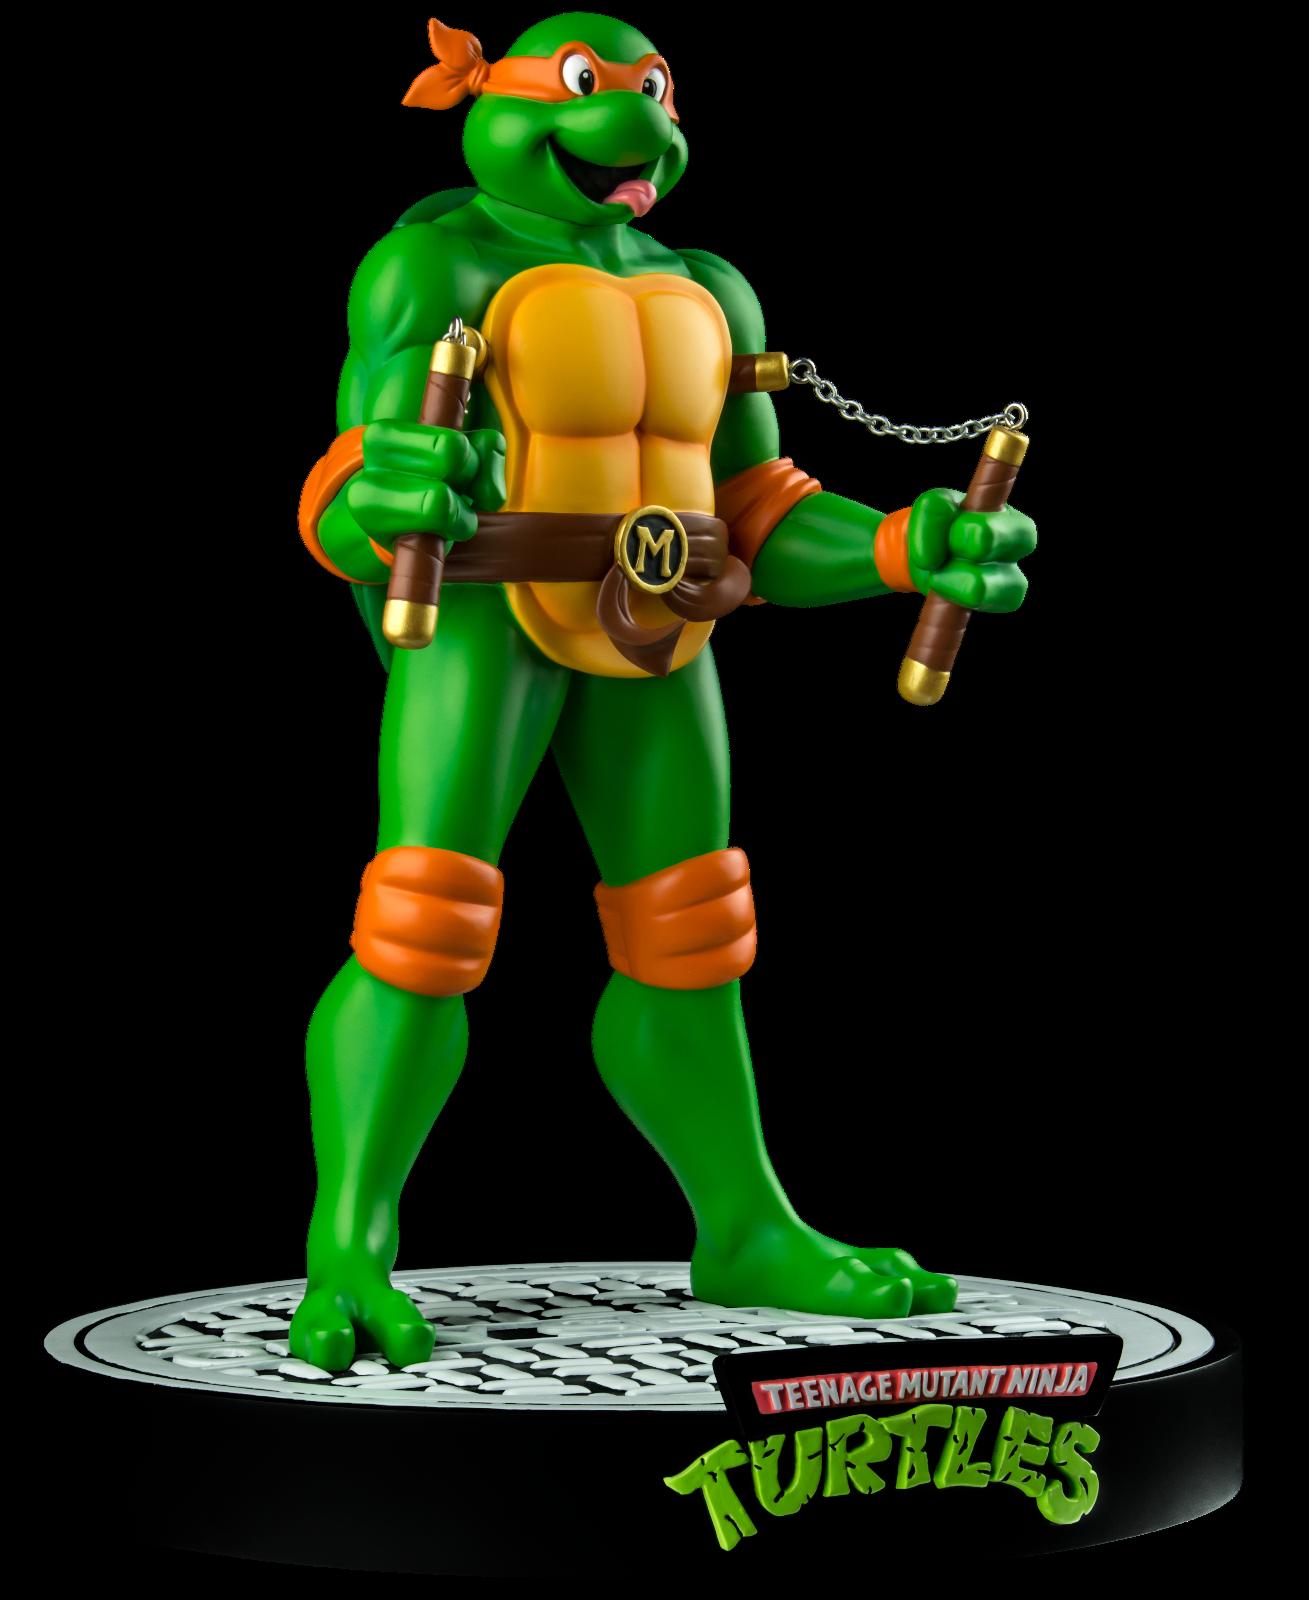 Ikon Collectibles Tartarughe Ninja Mutanti Adolescenti Tnmt Michelangelo 30.5cm